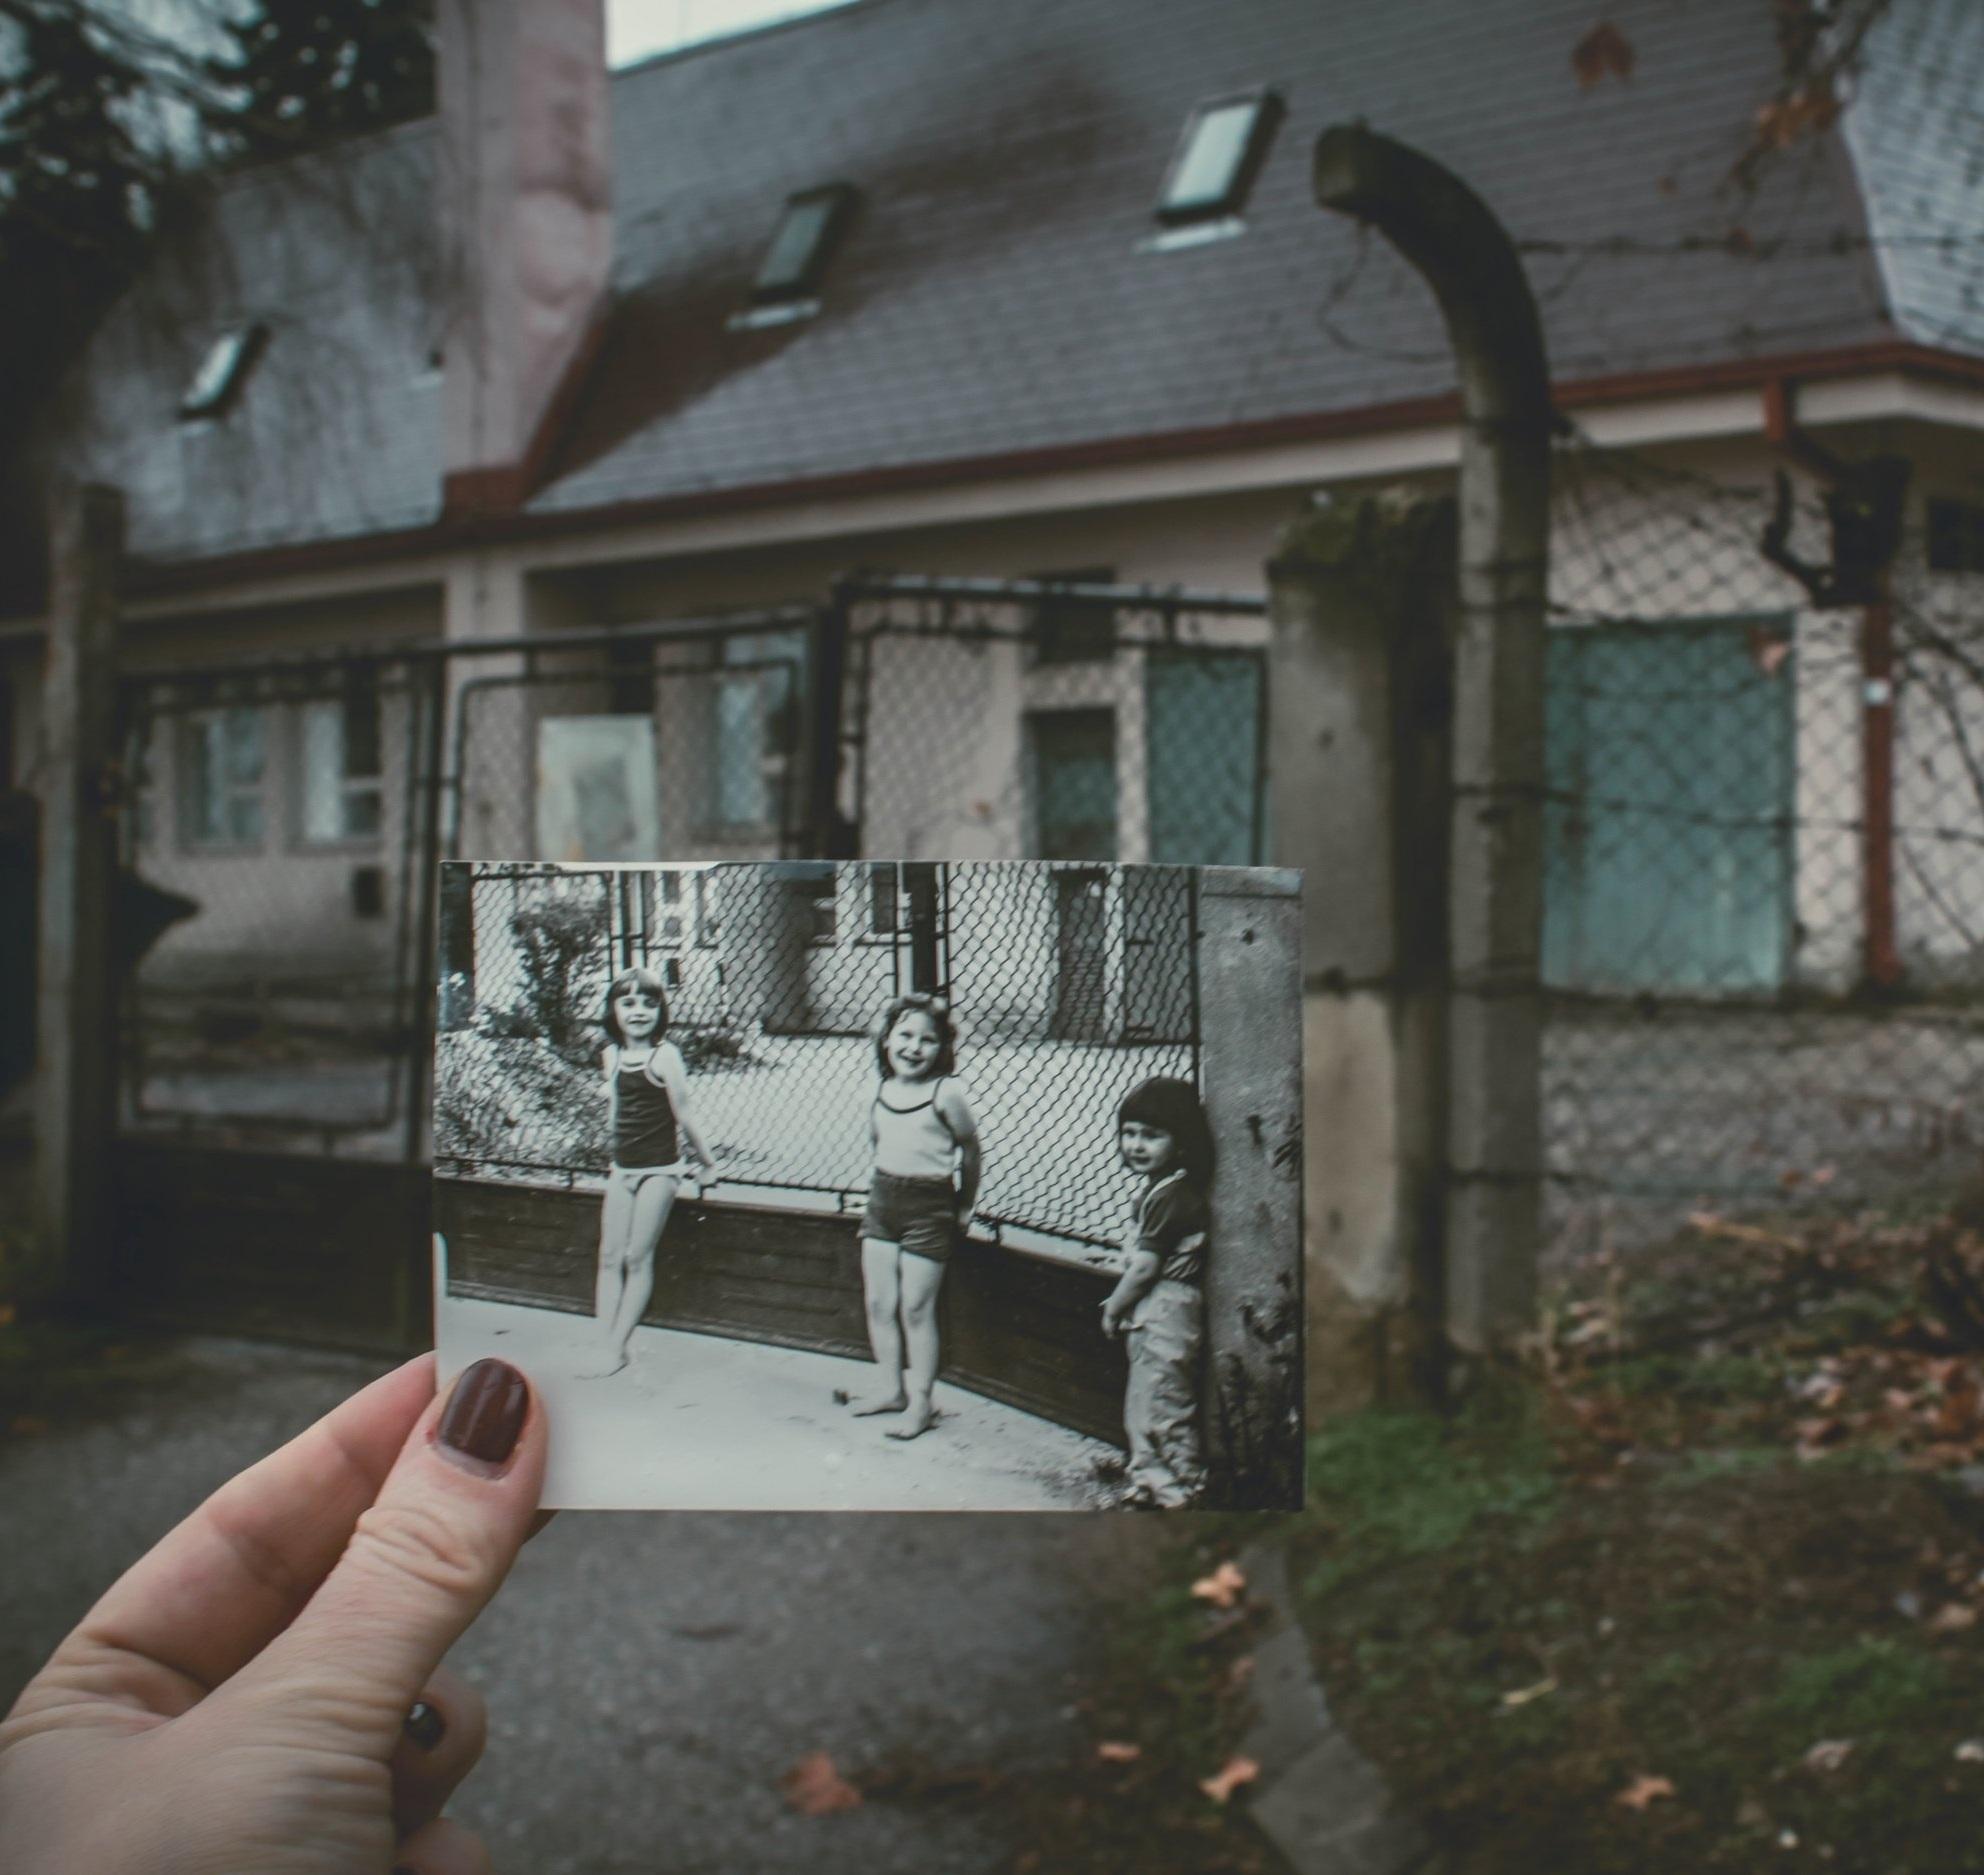 Childhood+anita-jankovic-606752-unsplash.jpg